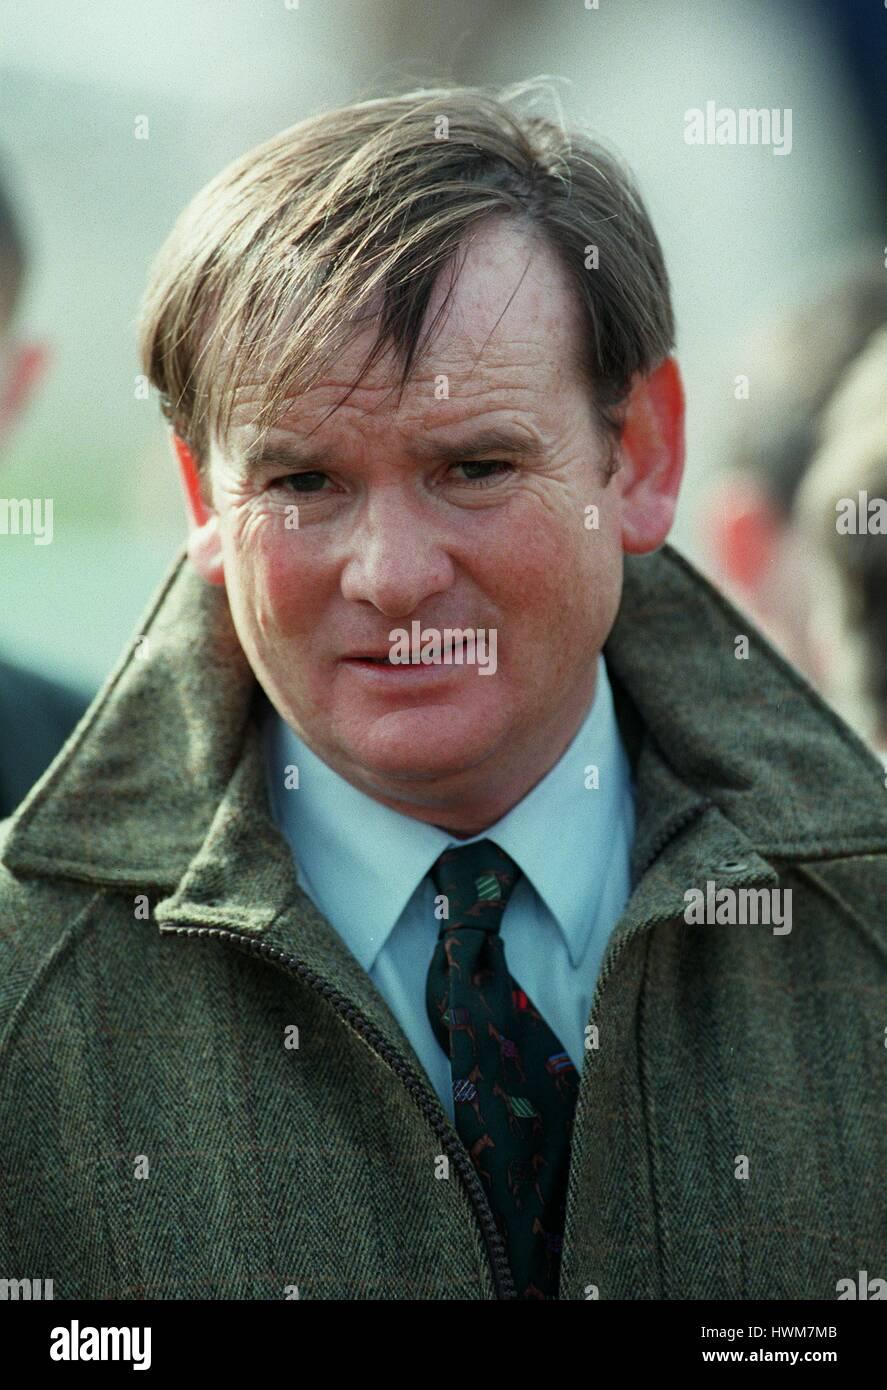 JOHN WHITE RACE HORSE TRAINER 18 March 1997 - Stock Image